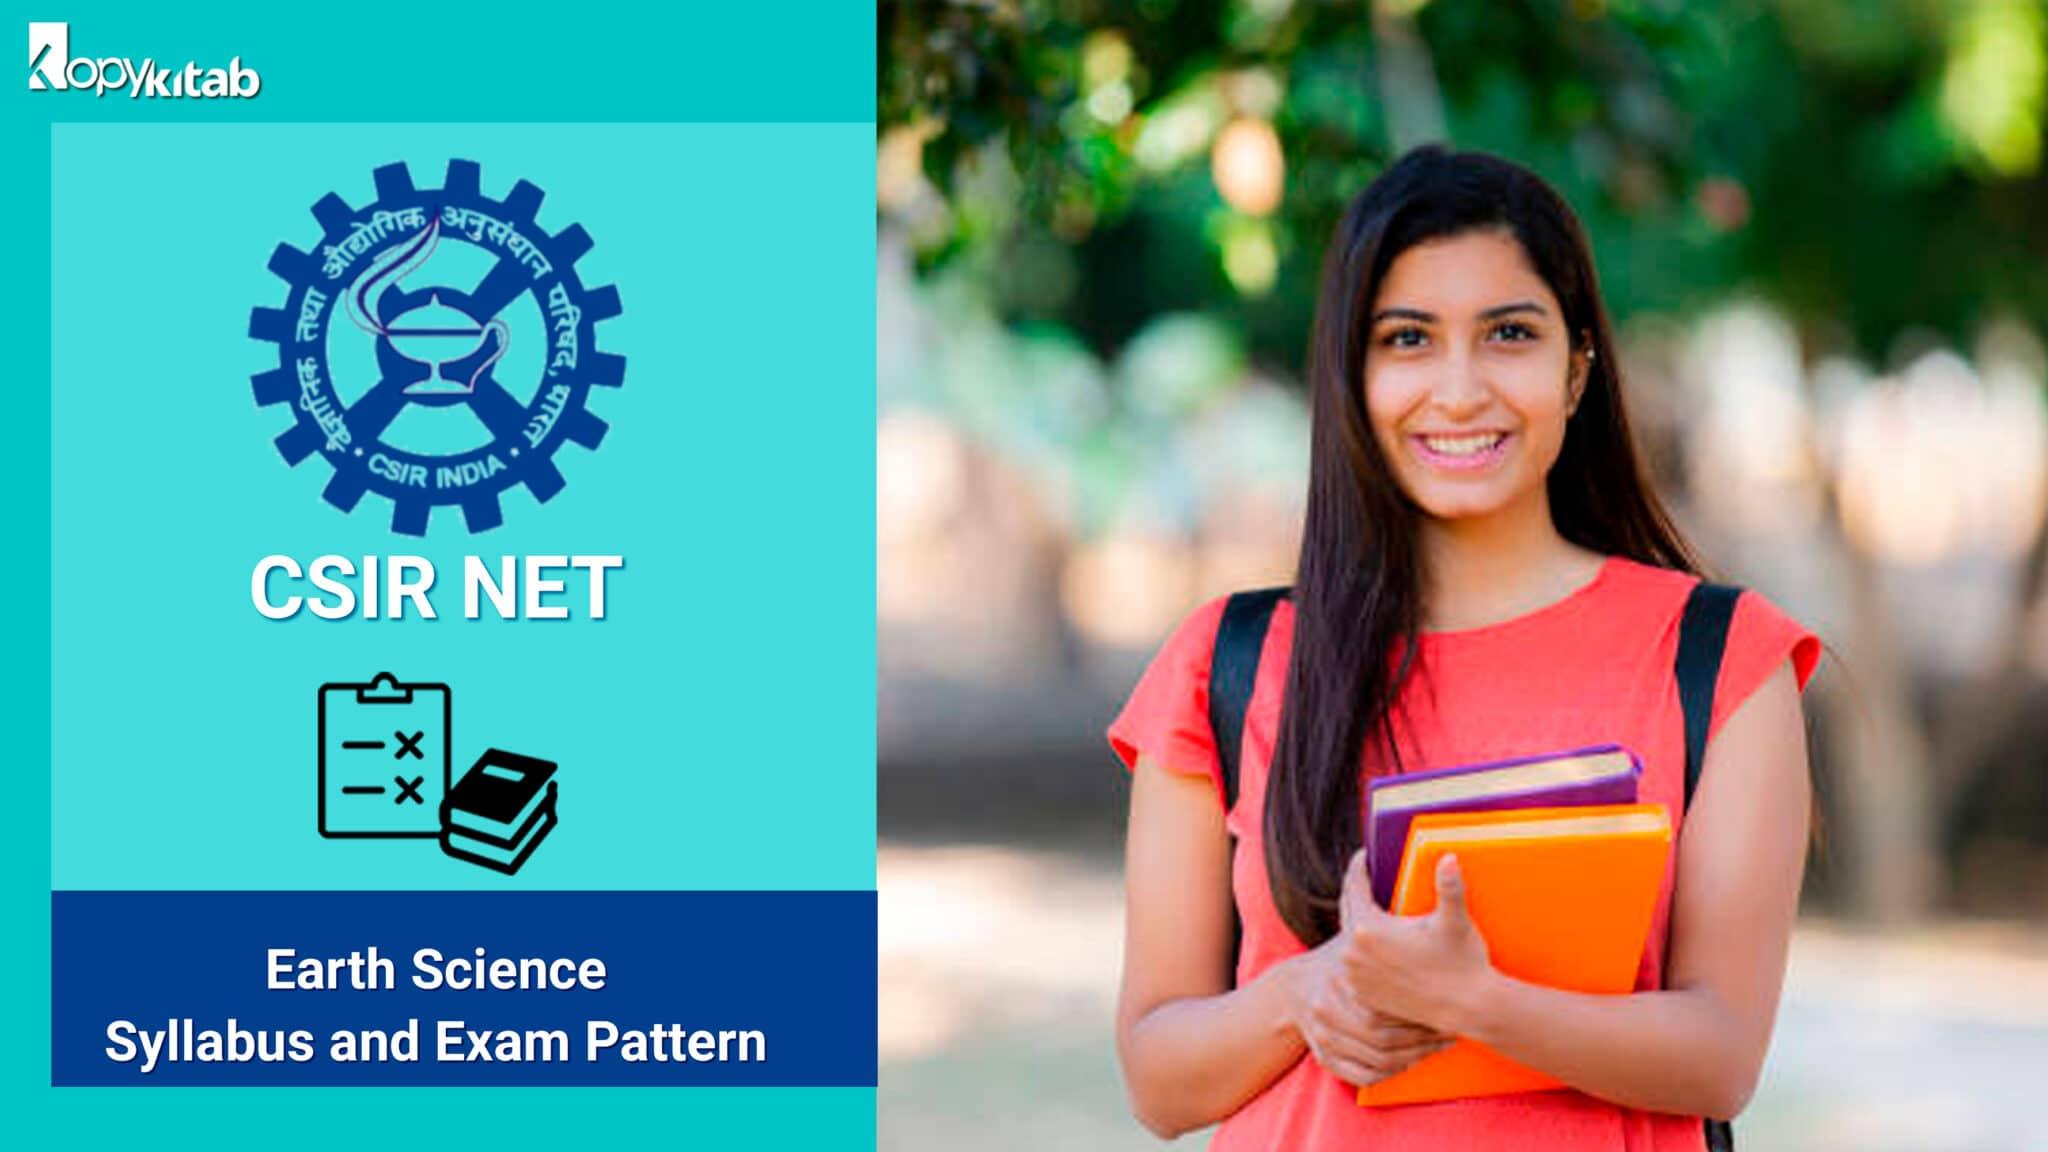 CSIR NET Earth Science Syllabus and Exam Pattern